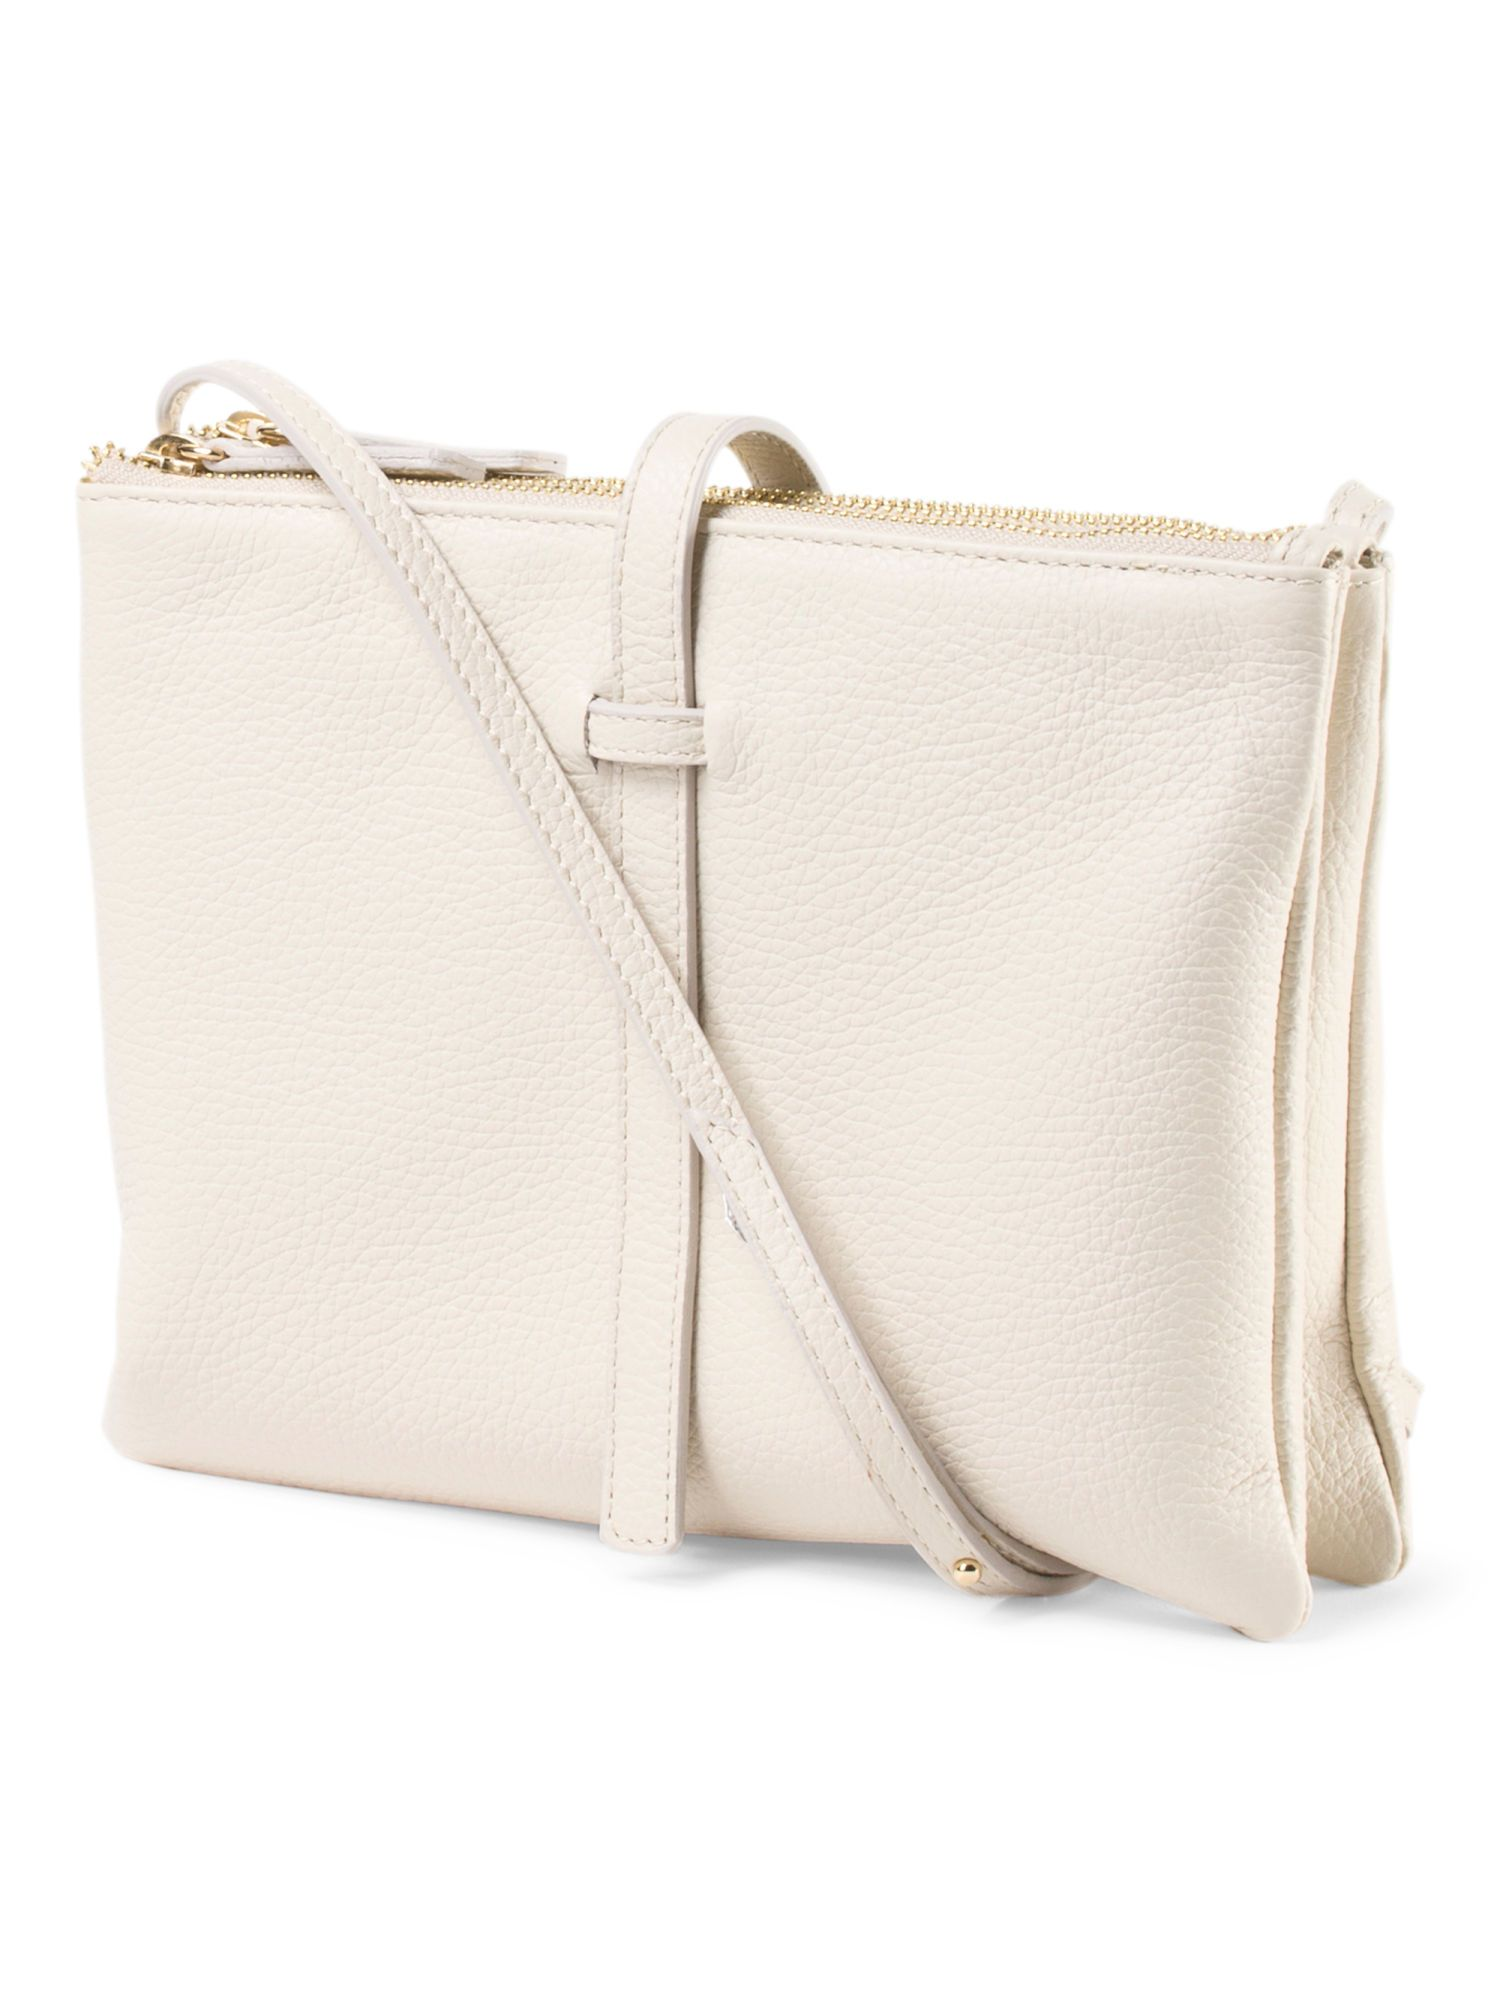 Vittoria Napoli Made In Italy Leather Two Compartment Crossbody Tj Ma 80